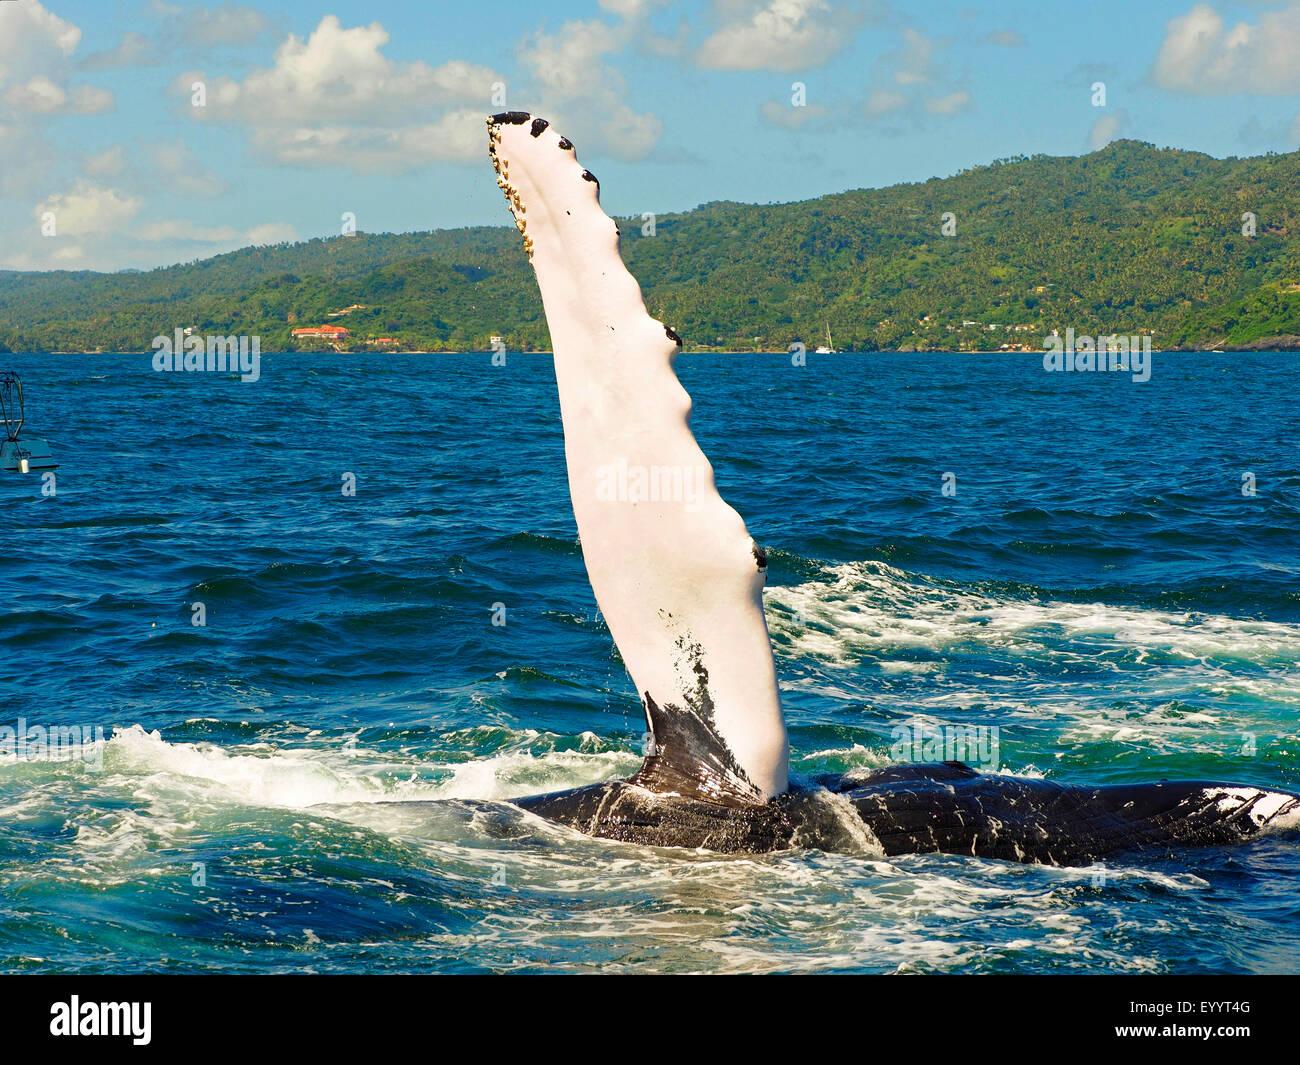 La ballena jorobada (Megaptera novaeangliae), la ballena jorobada bofetadas su aleta, Samana, República Dominicana Foto de stock